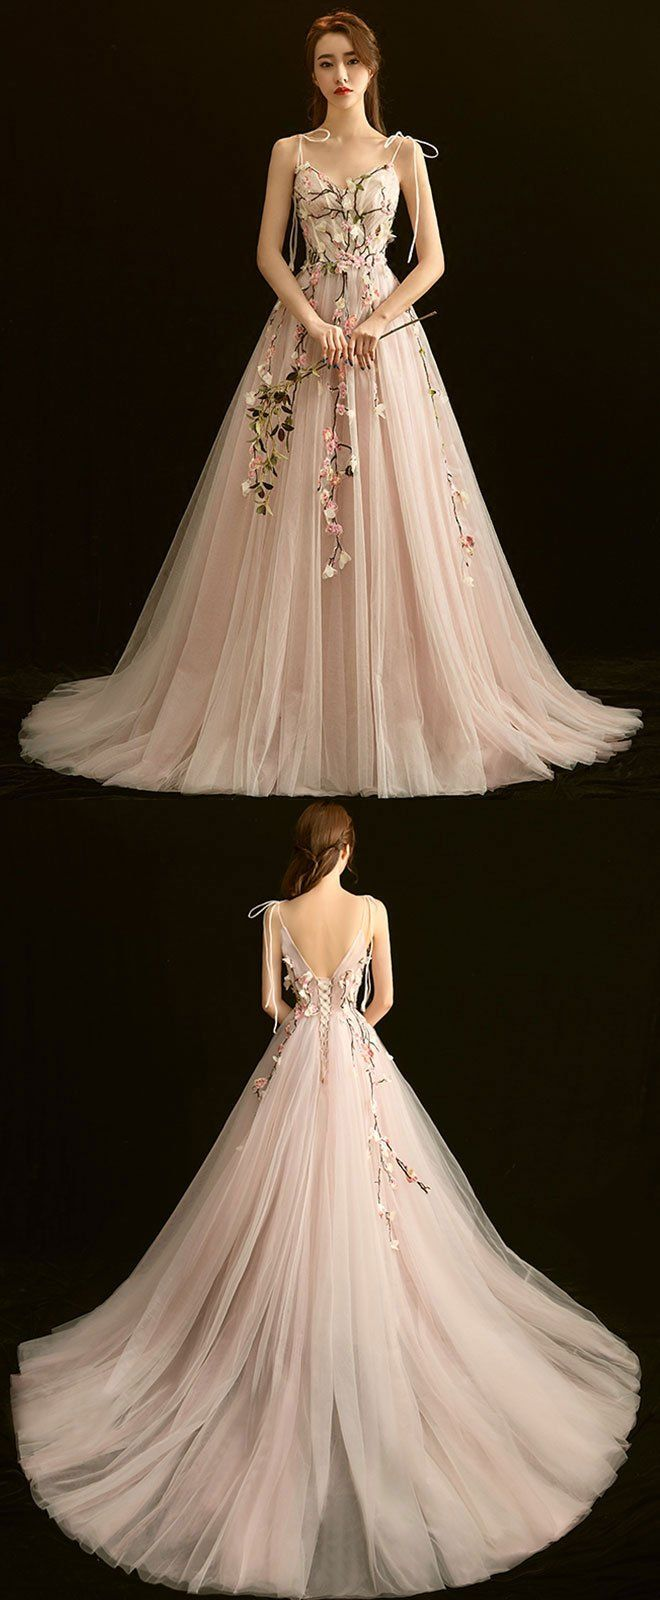 High quality v neck lace long prom dress light pink evening dress